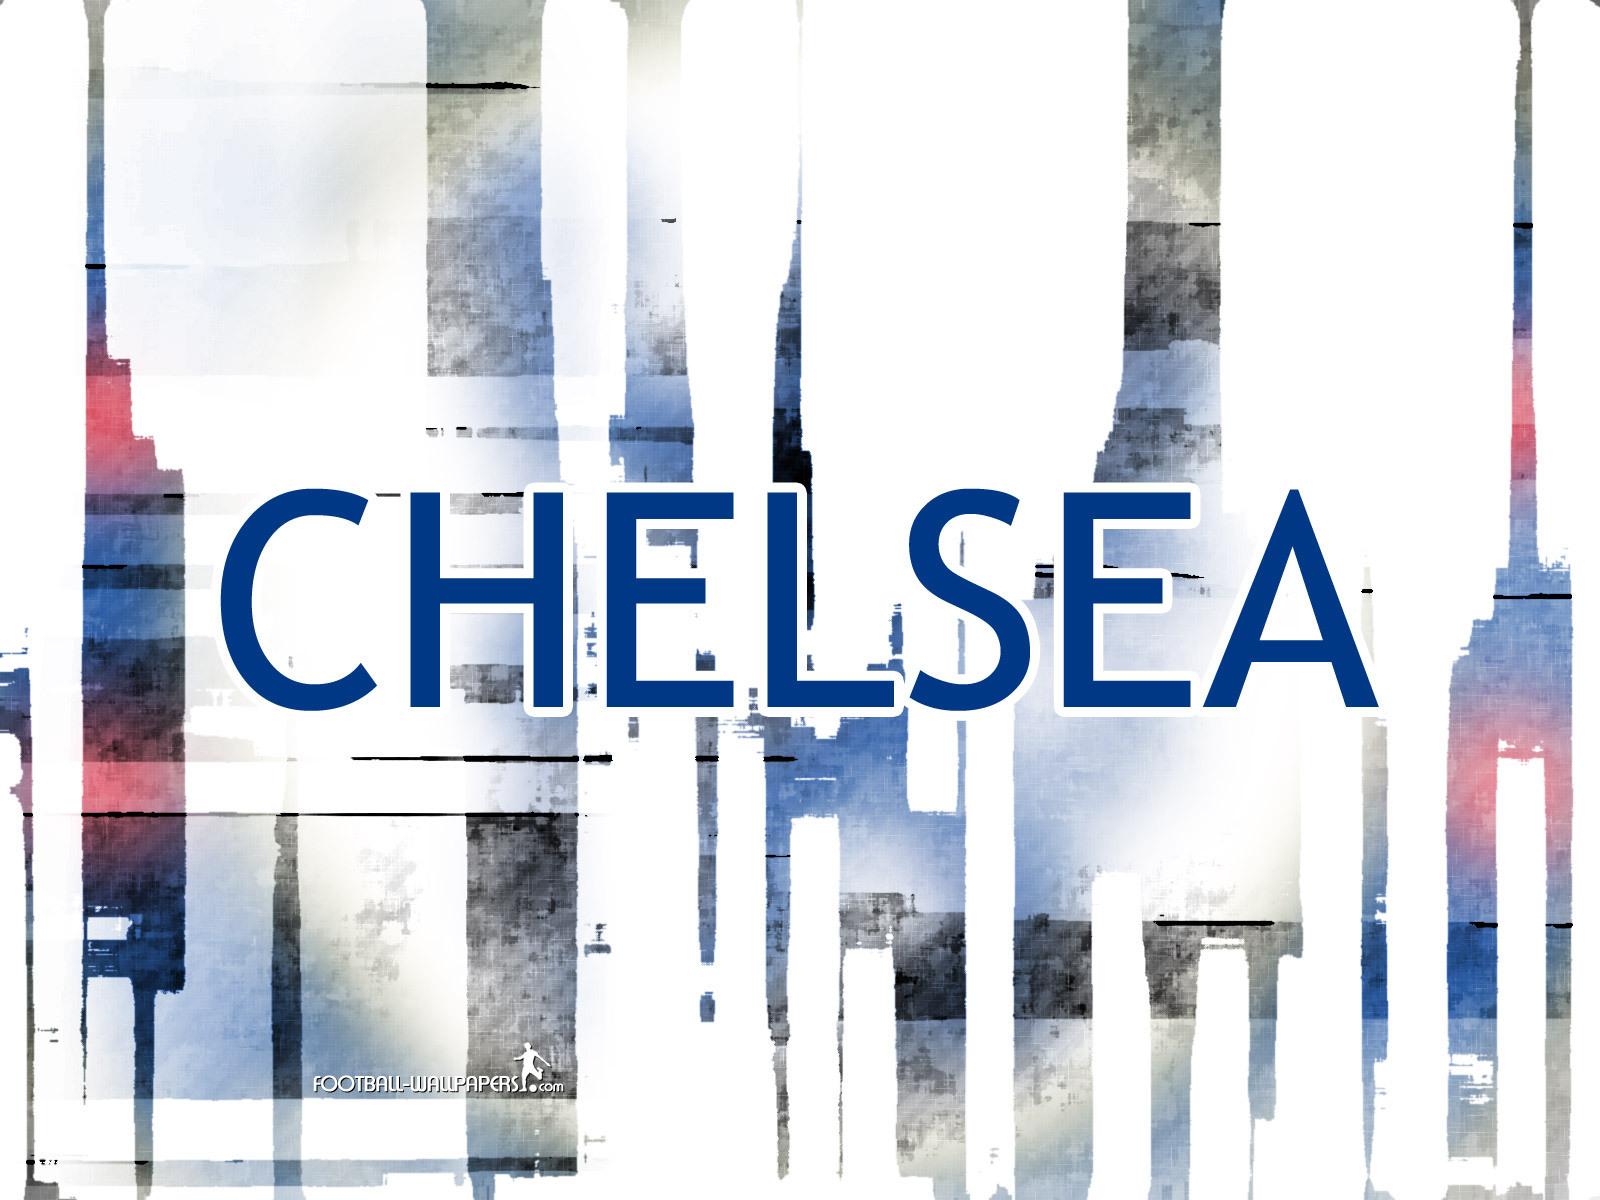 Chelsea: Chelsea FC Wallpaper (2505620)